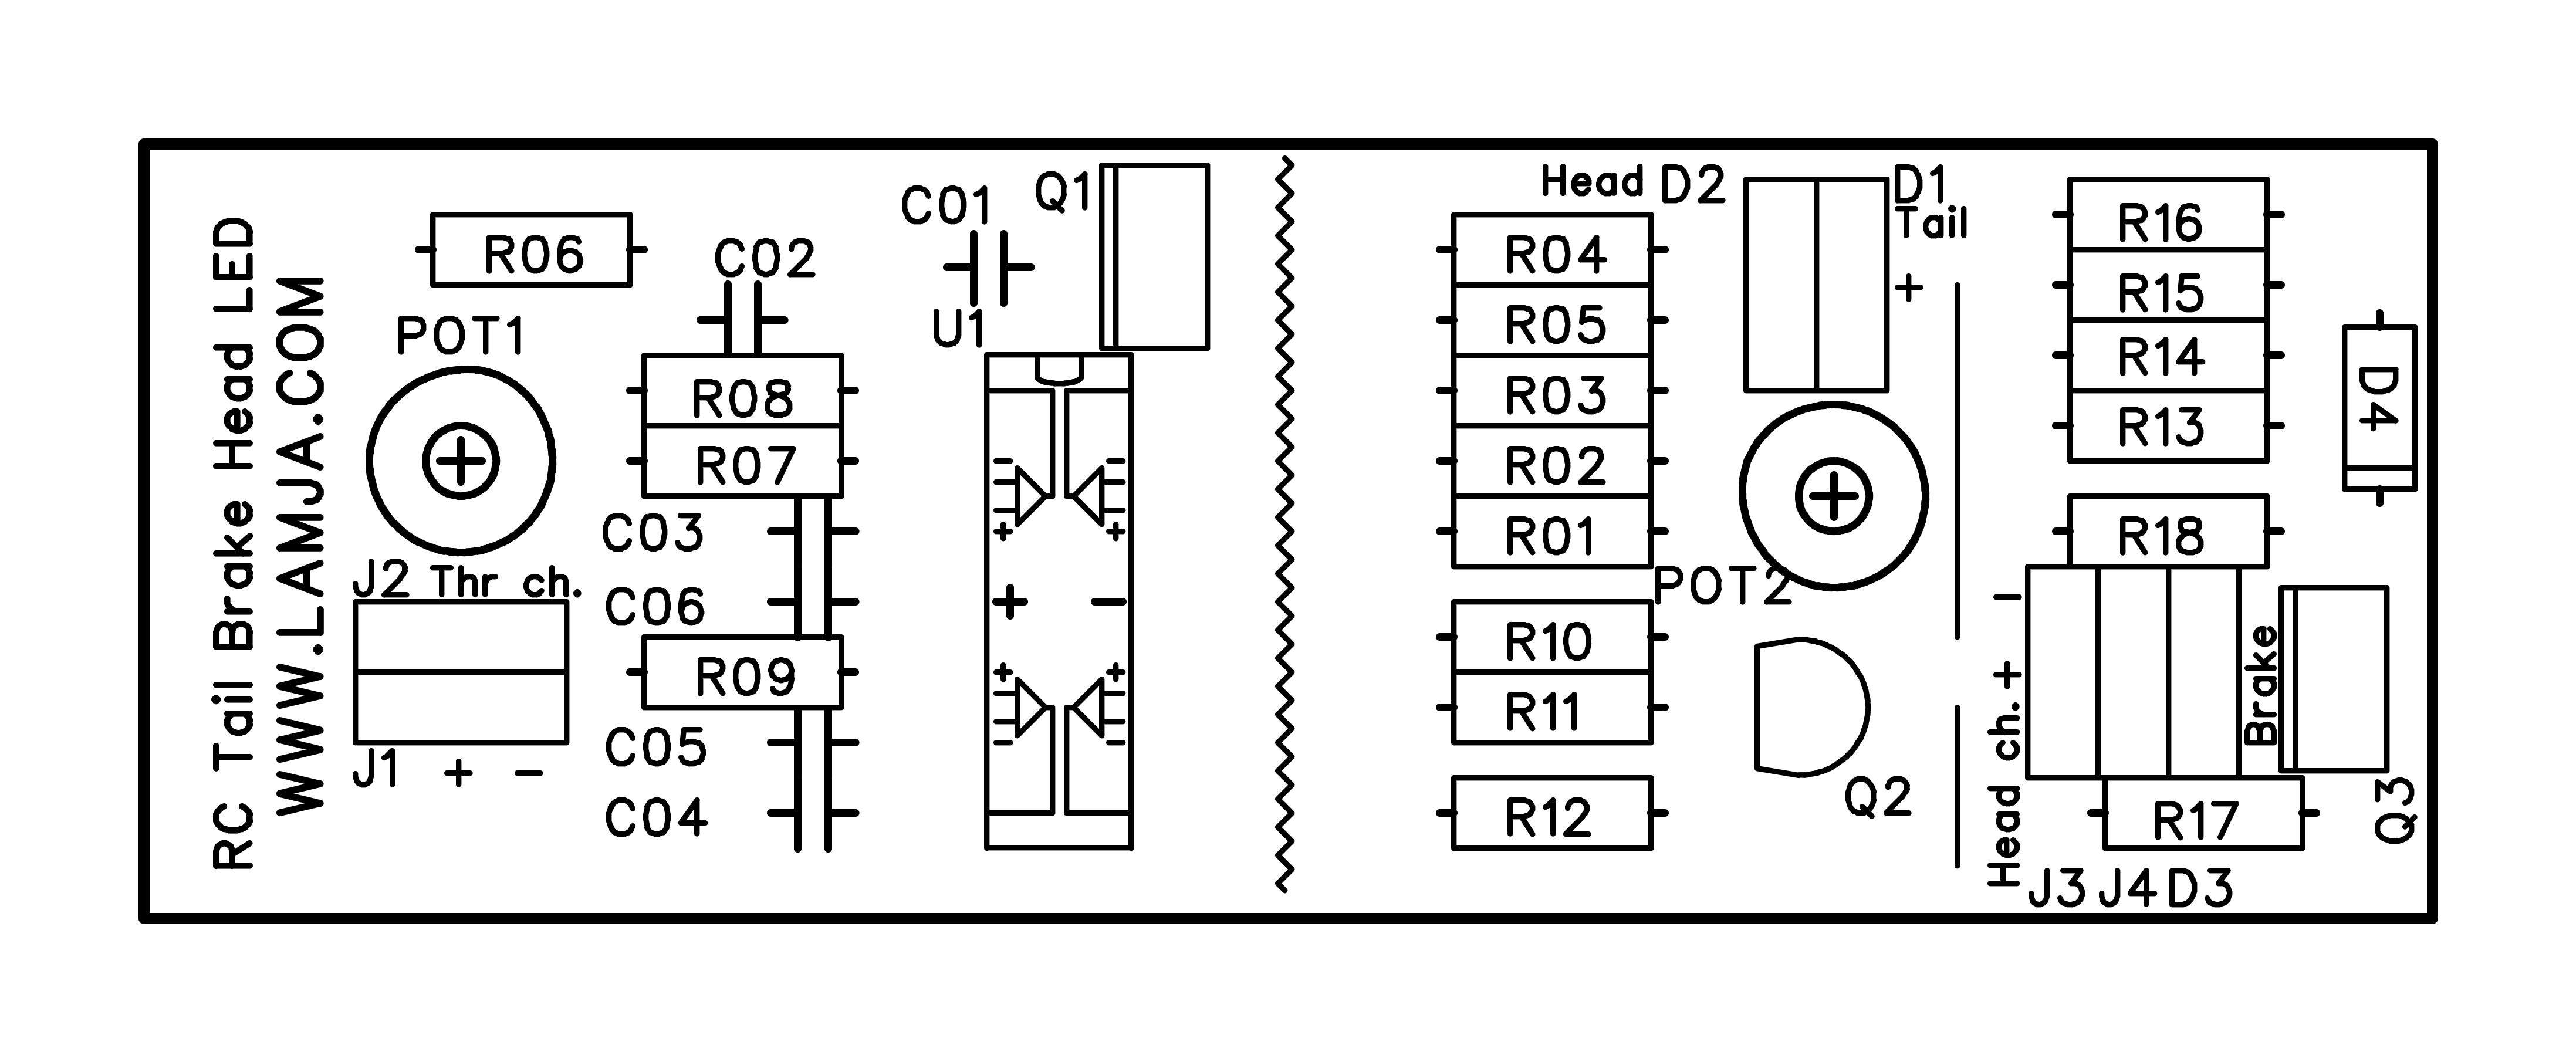 Berühmt Underbody Rc Led Wiring Diagram Ideen - Schaltplan Serie ...